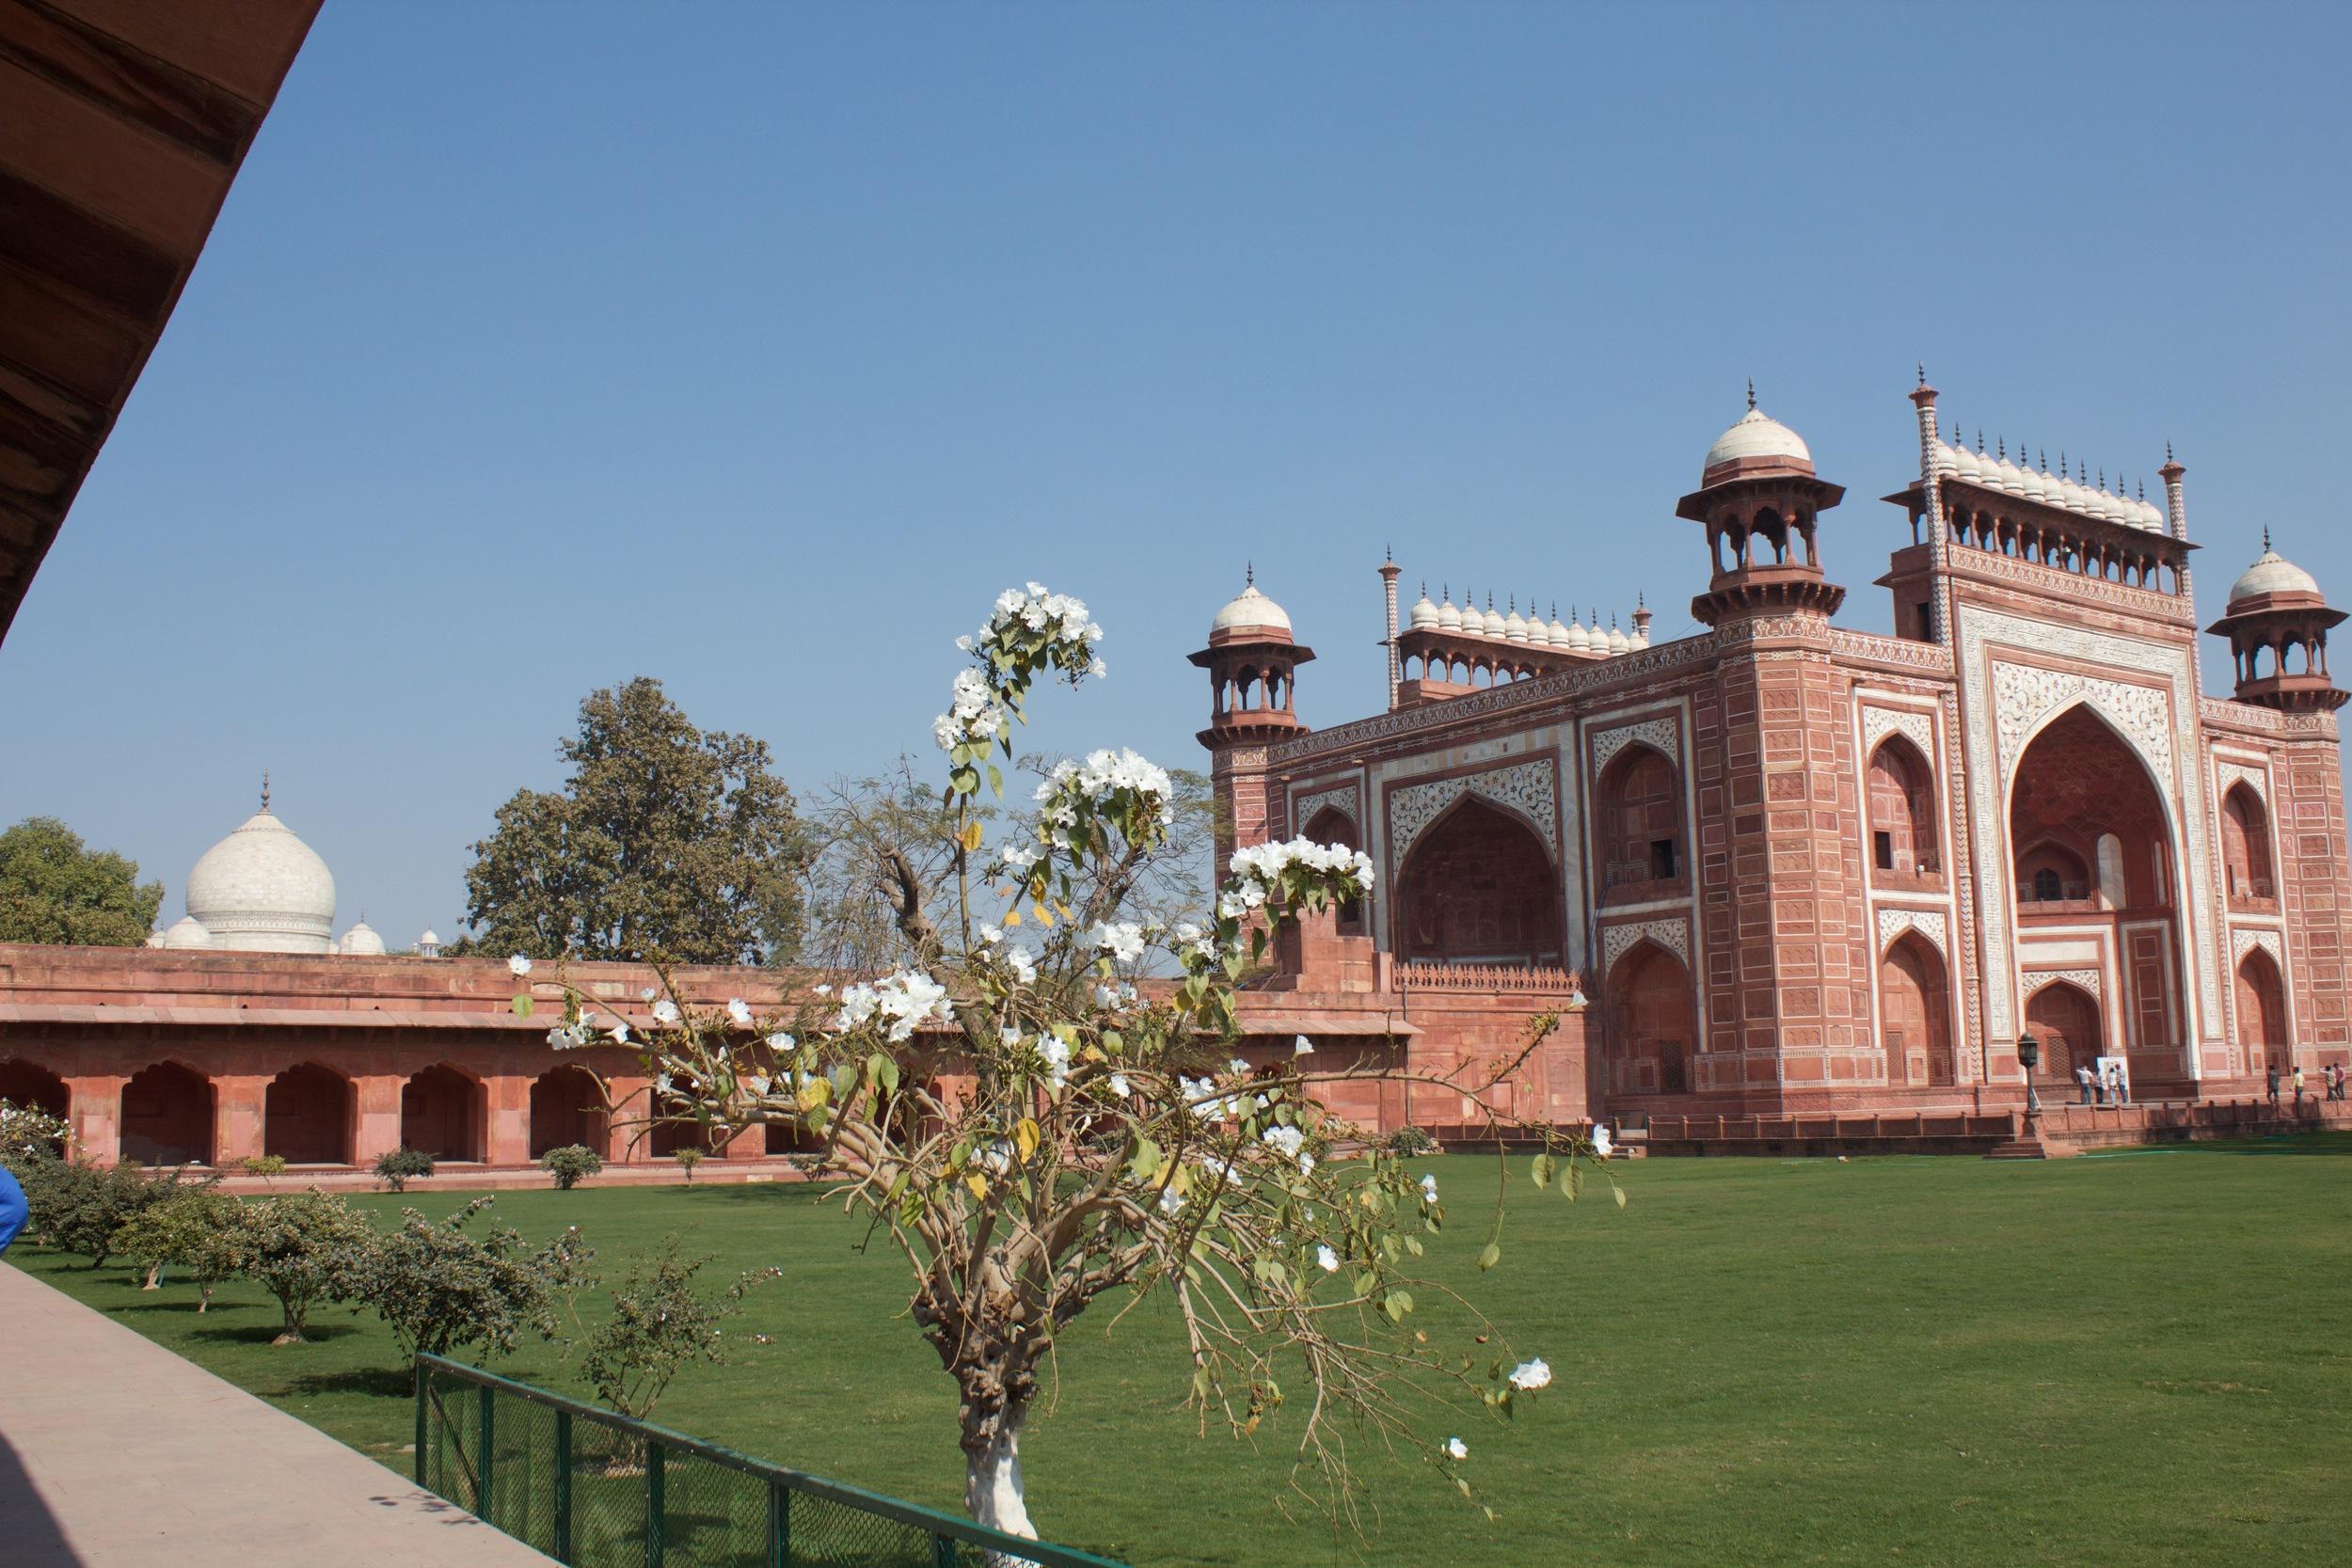 out side the Taj Mahal